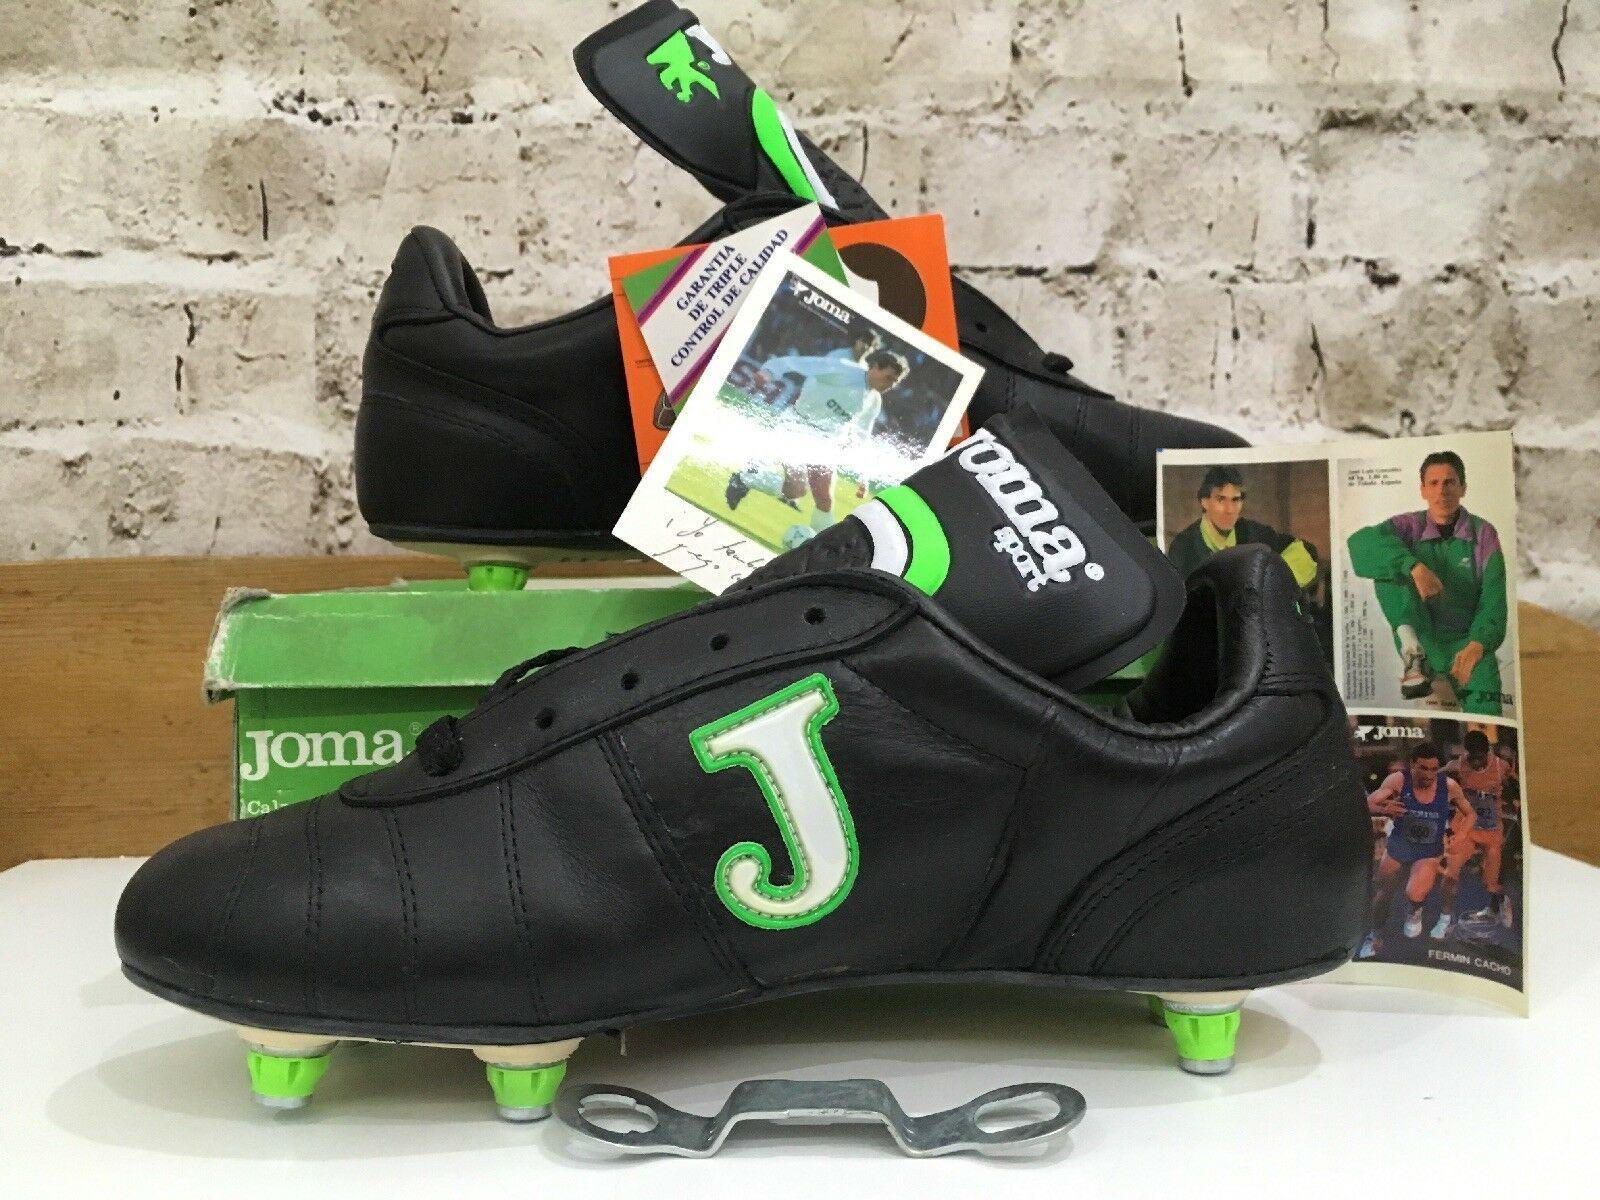 meet 33f67 78c74 Vintage 1980s Joma Sports football Boots Uk 7 Eu 40 Rare Soccer OG  Butragueno   eBay